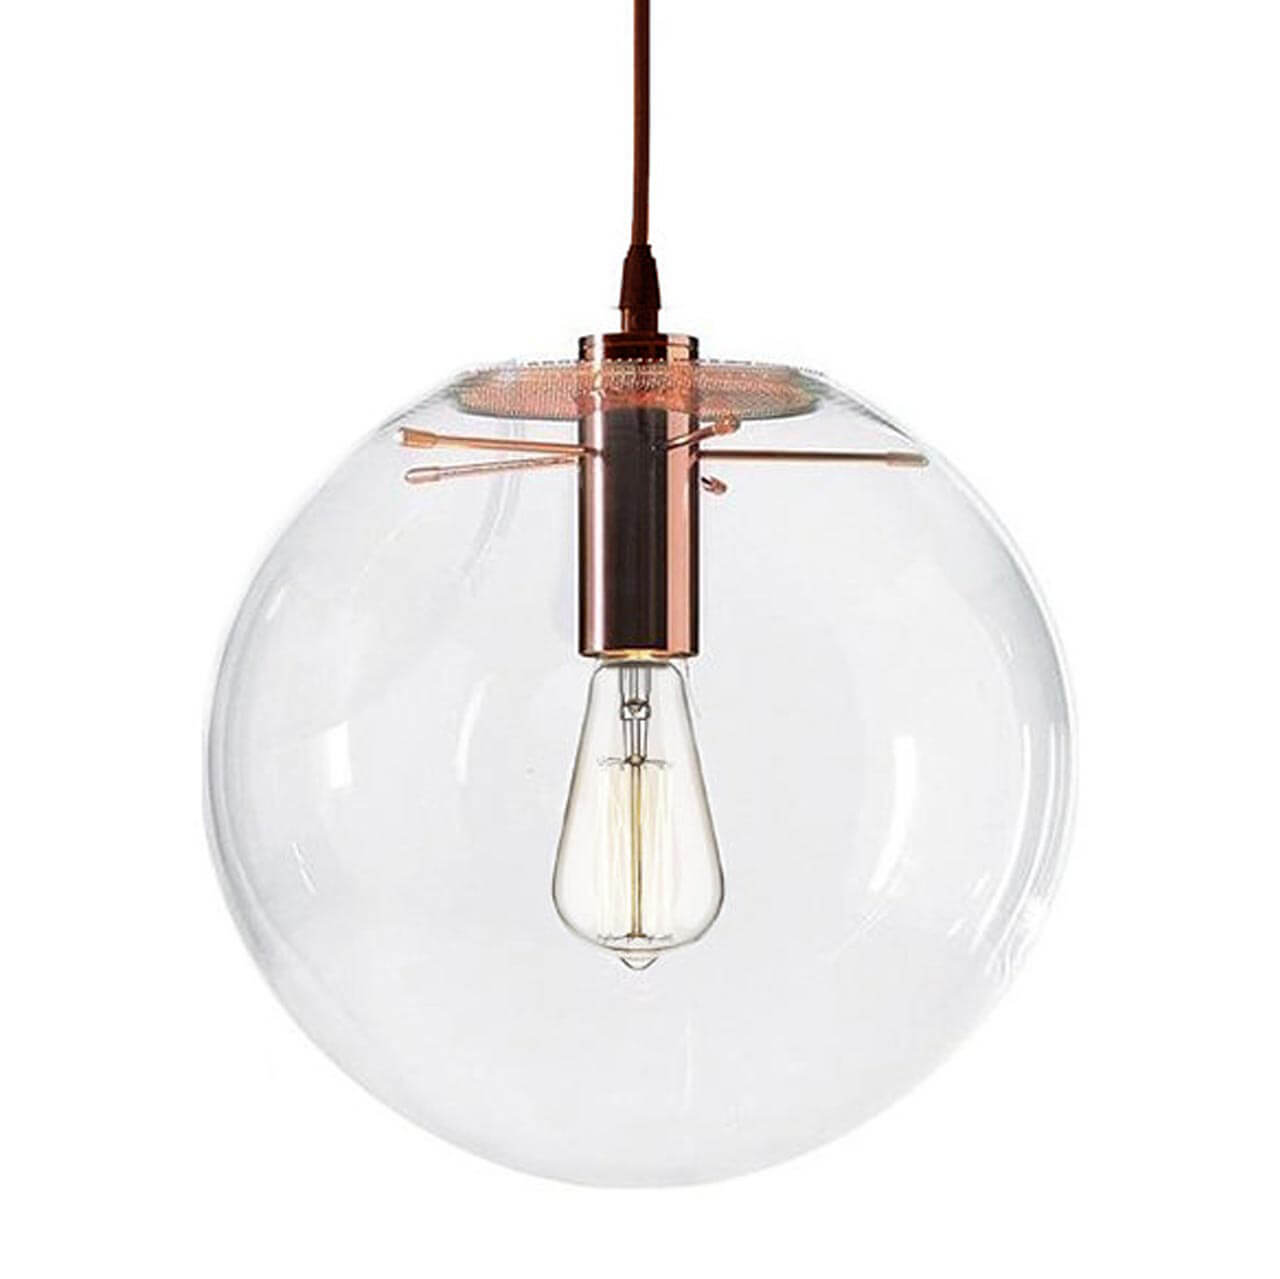 цена на Светильник Kink Light 07564-30,21 Меркурий